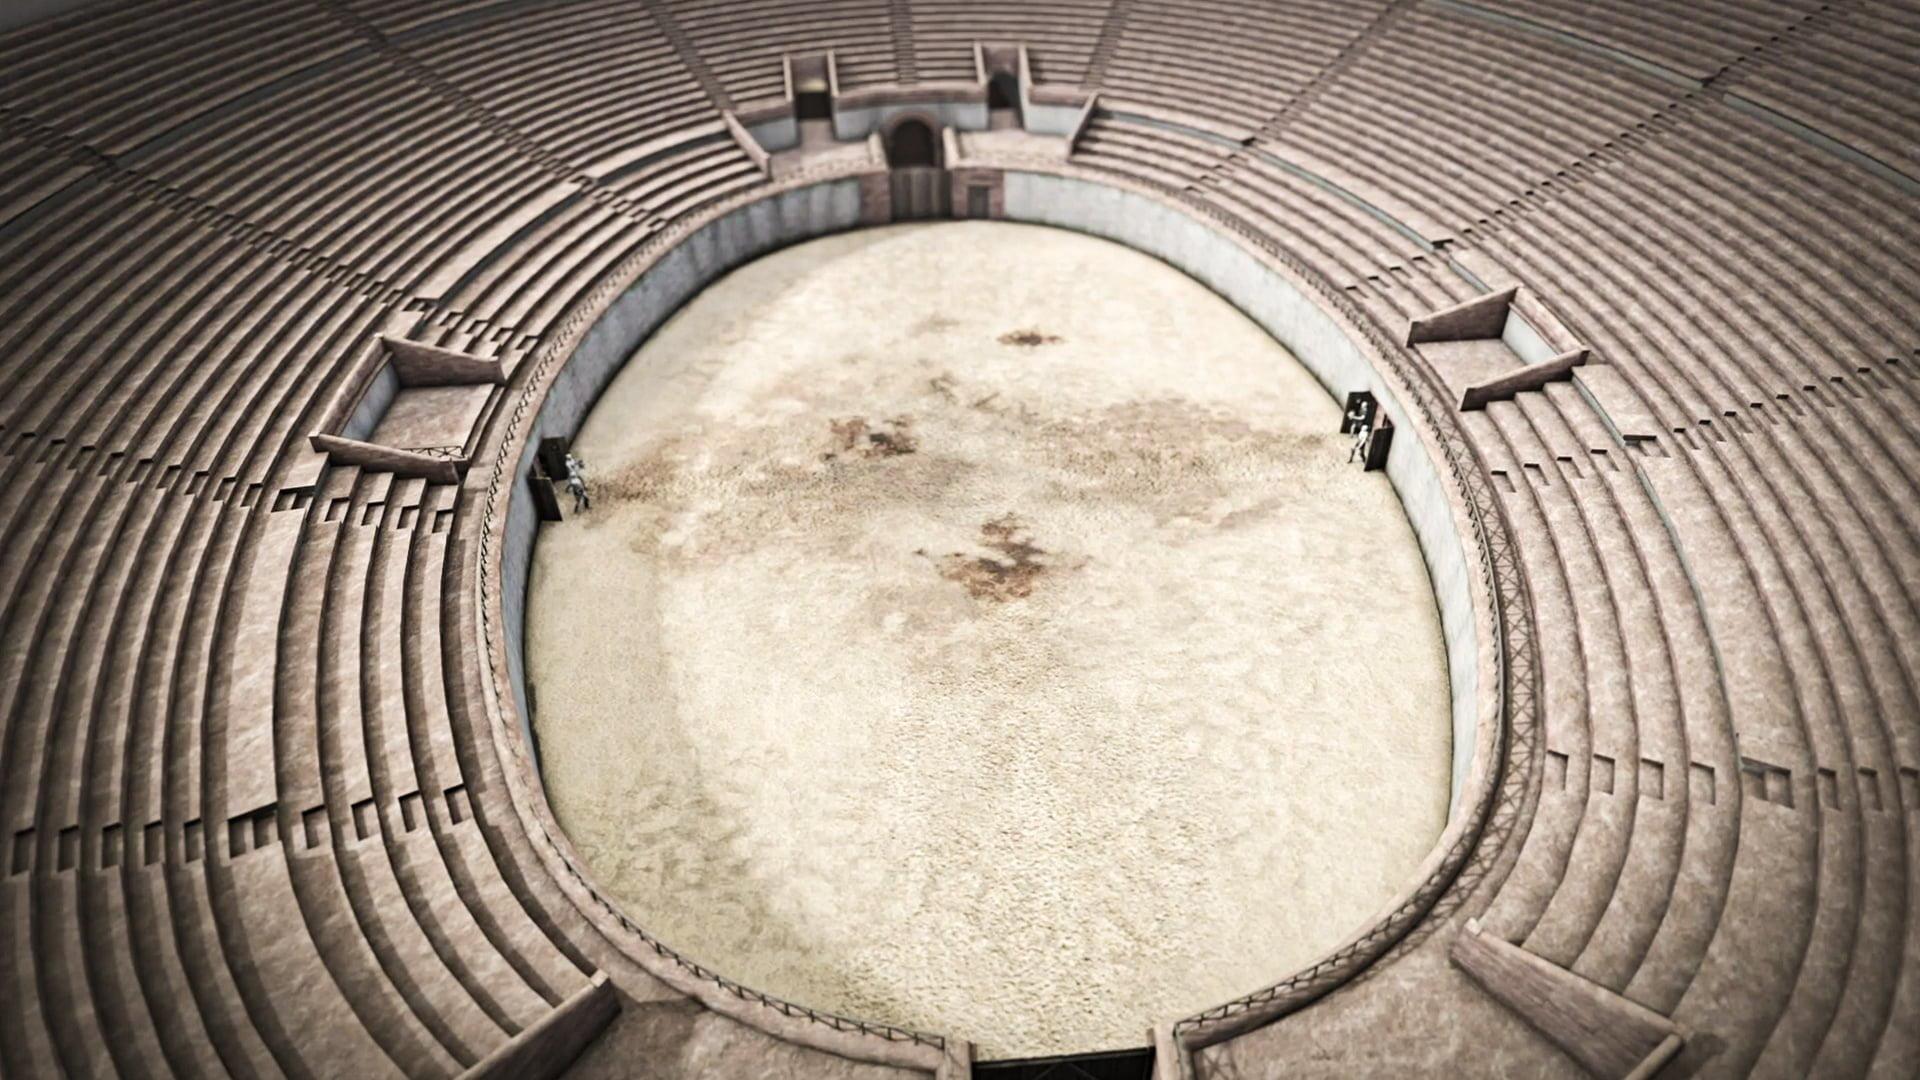 Augusta Raurica, Amphitheater, Screen, Arena, ikonaut